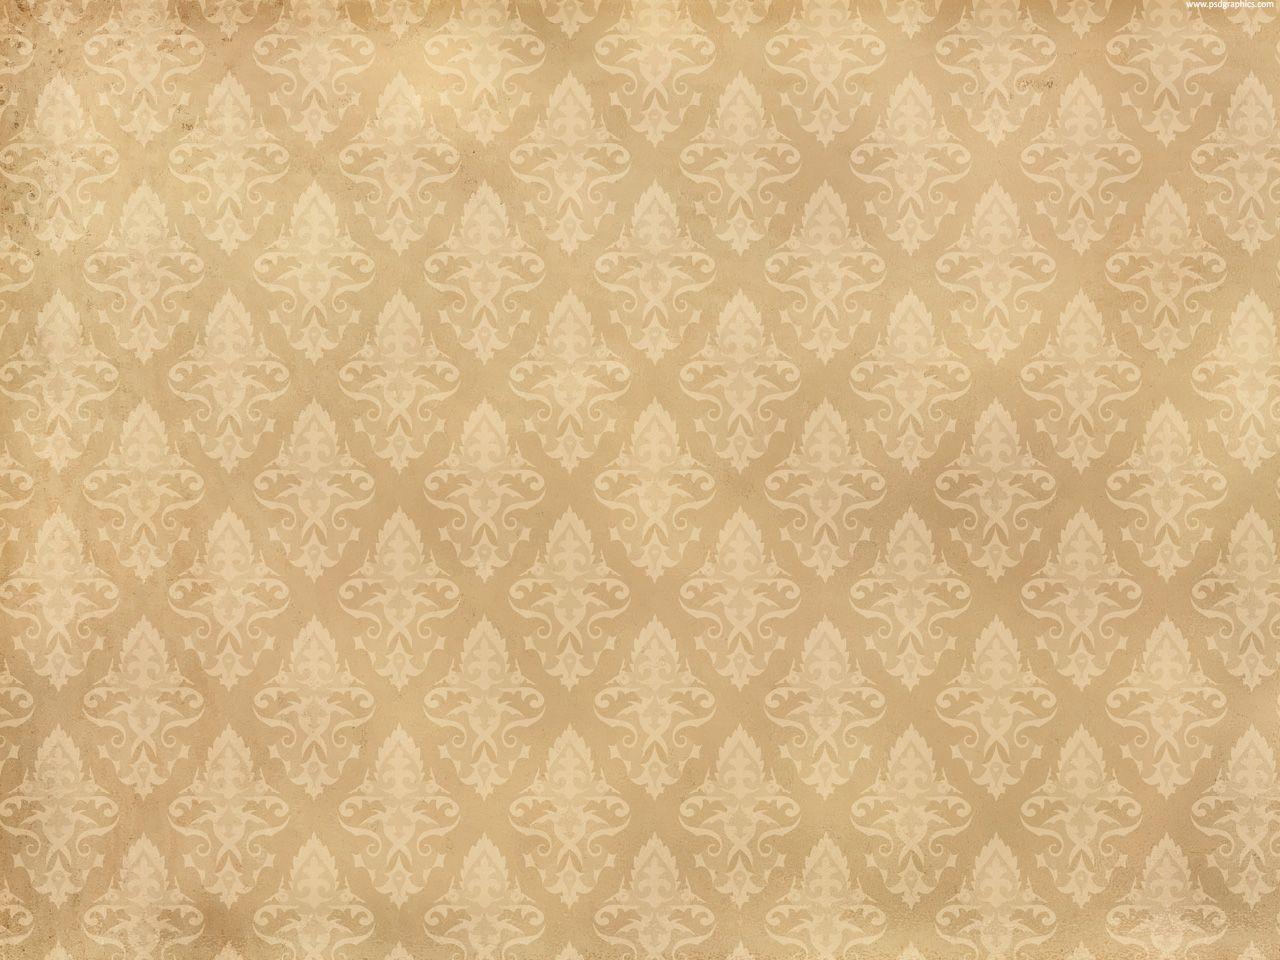 Vintage Wallpaper Background Medium Size Preview 1280x960px